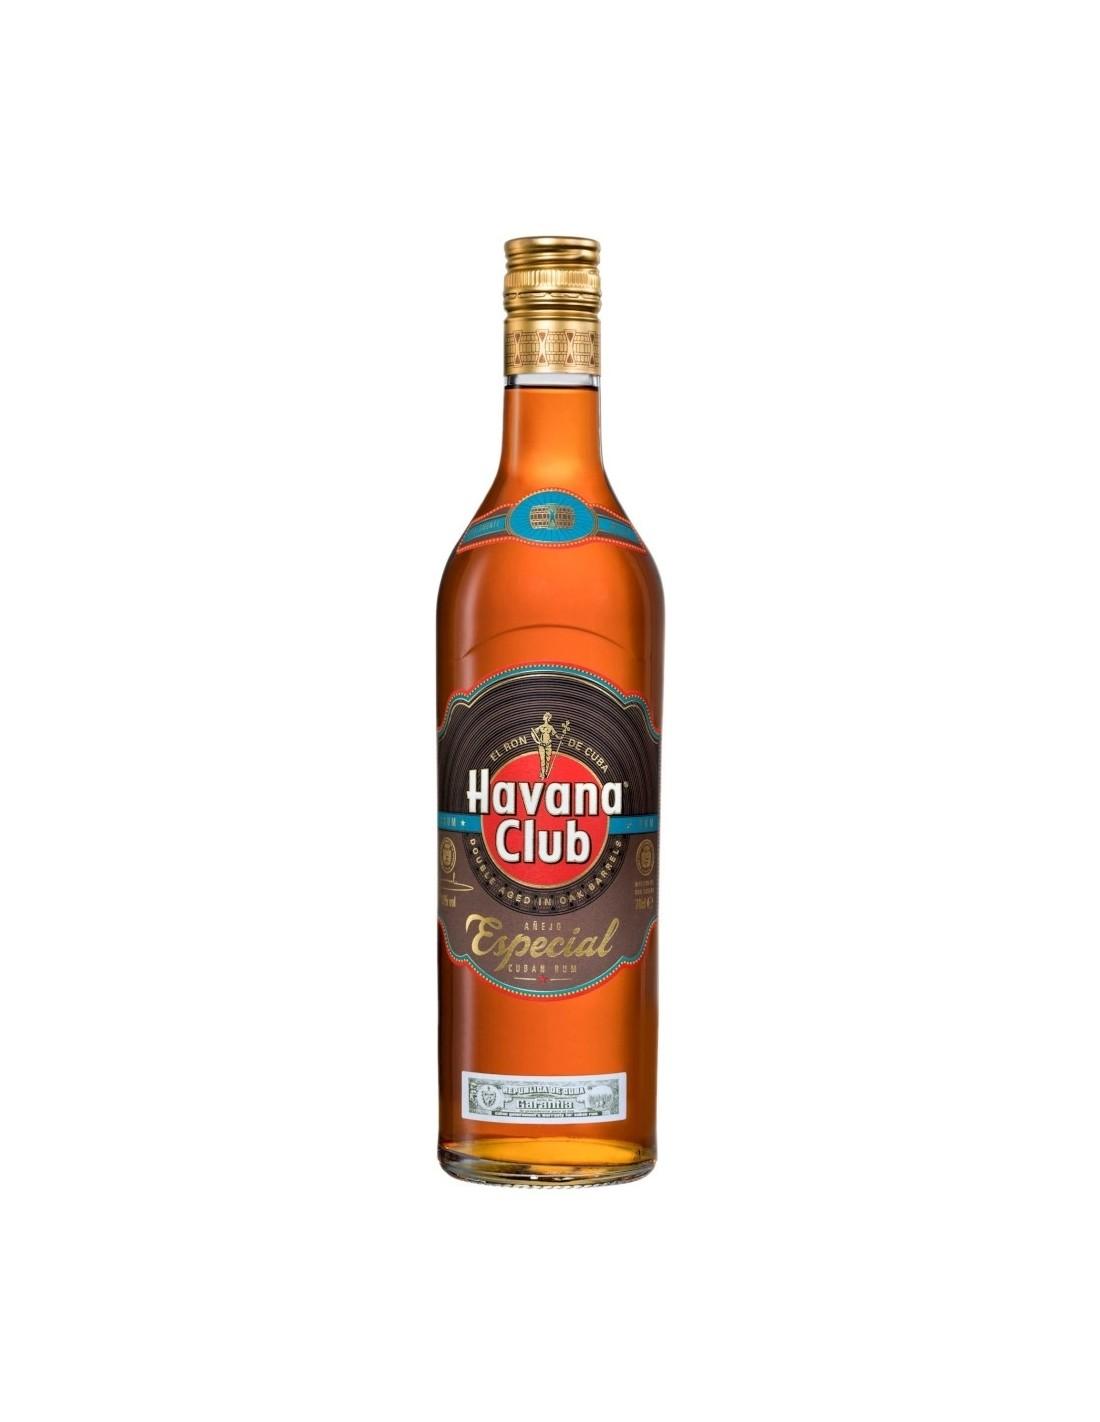 Rom negru Havana Club Especial, 40%, 0.7L